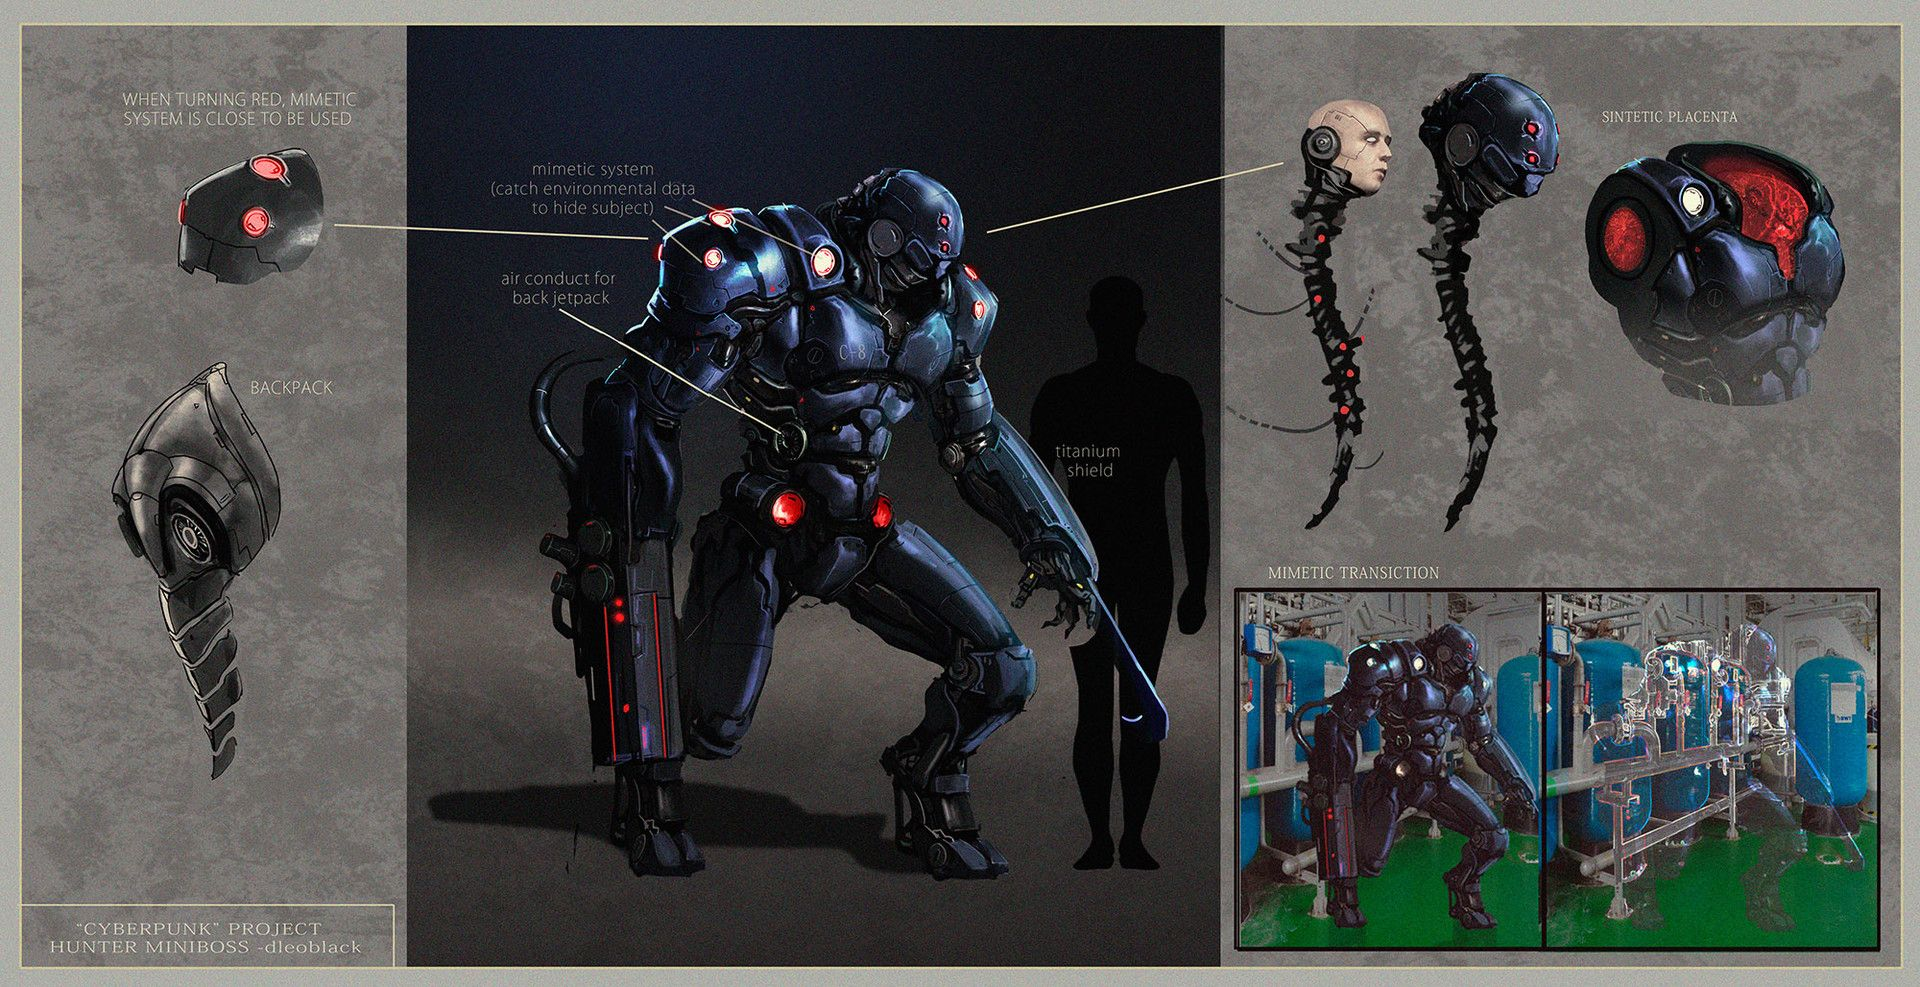 ArtStation - Cyberpunk - The Hunter, . Dleoblack